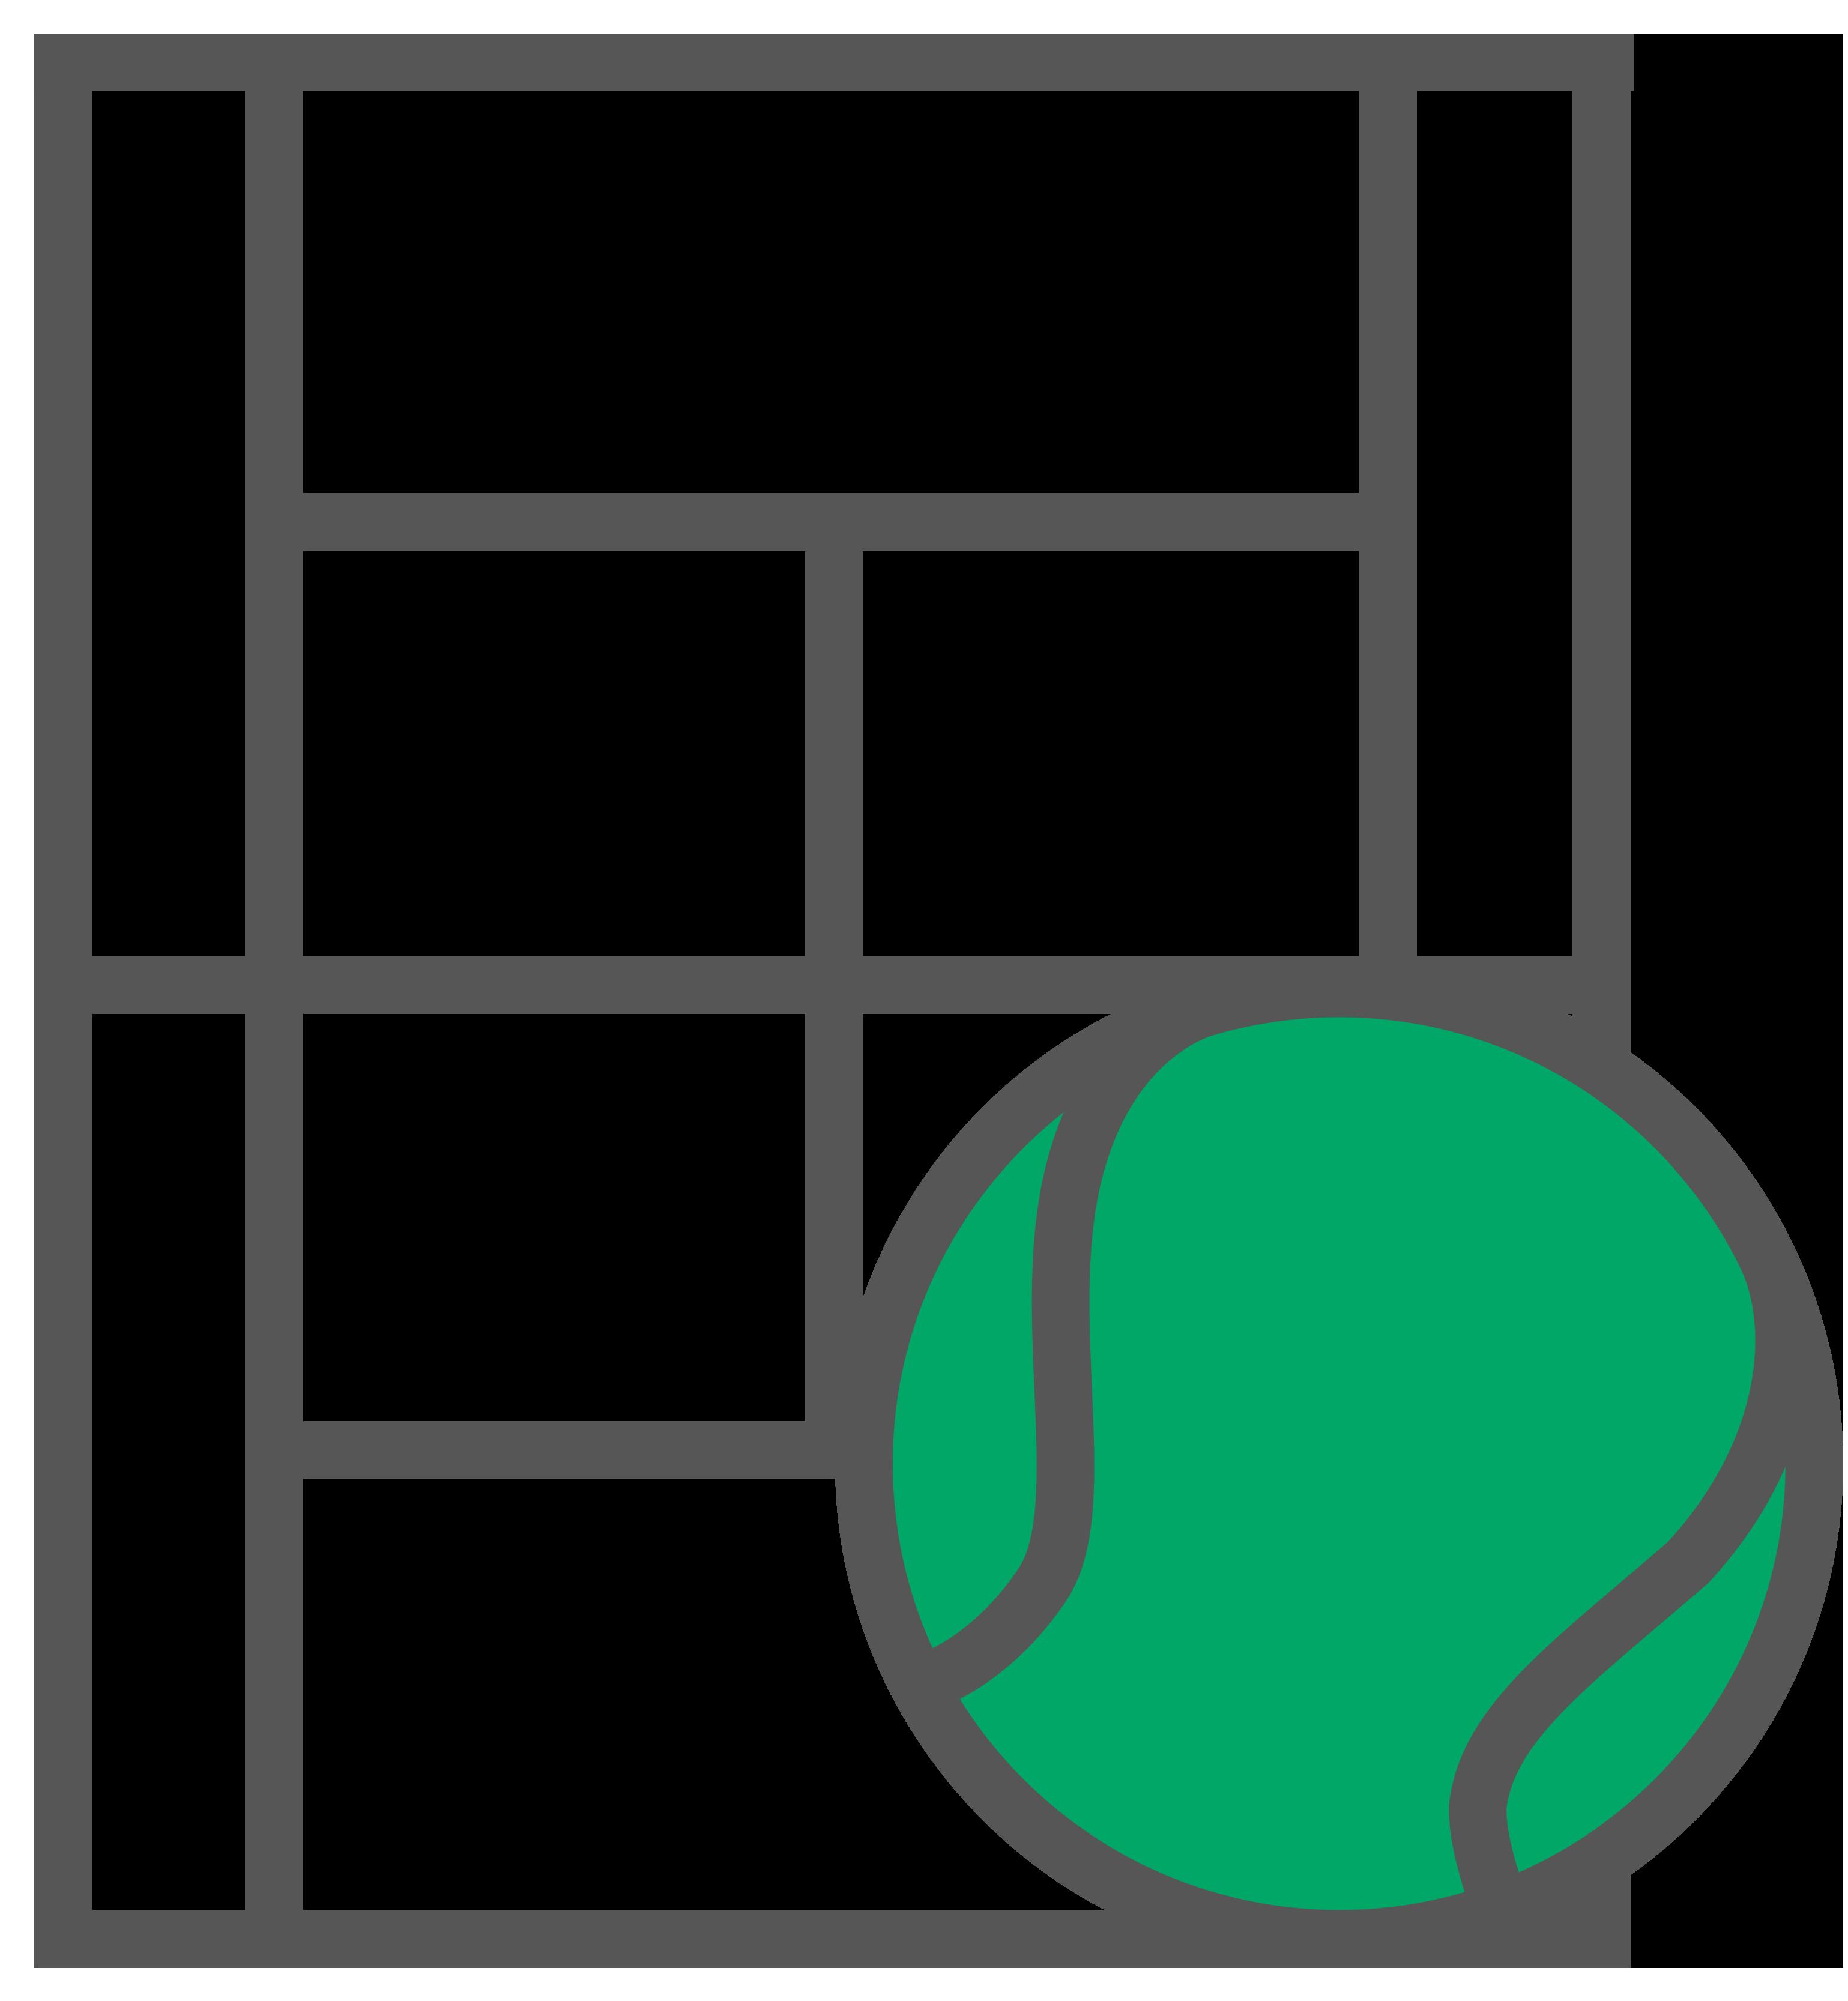 Icon for choosing tennis lesson location